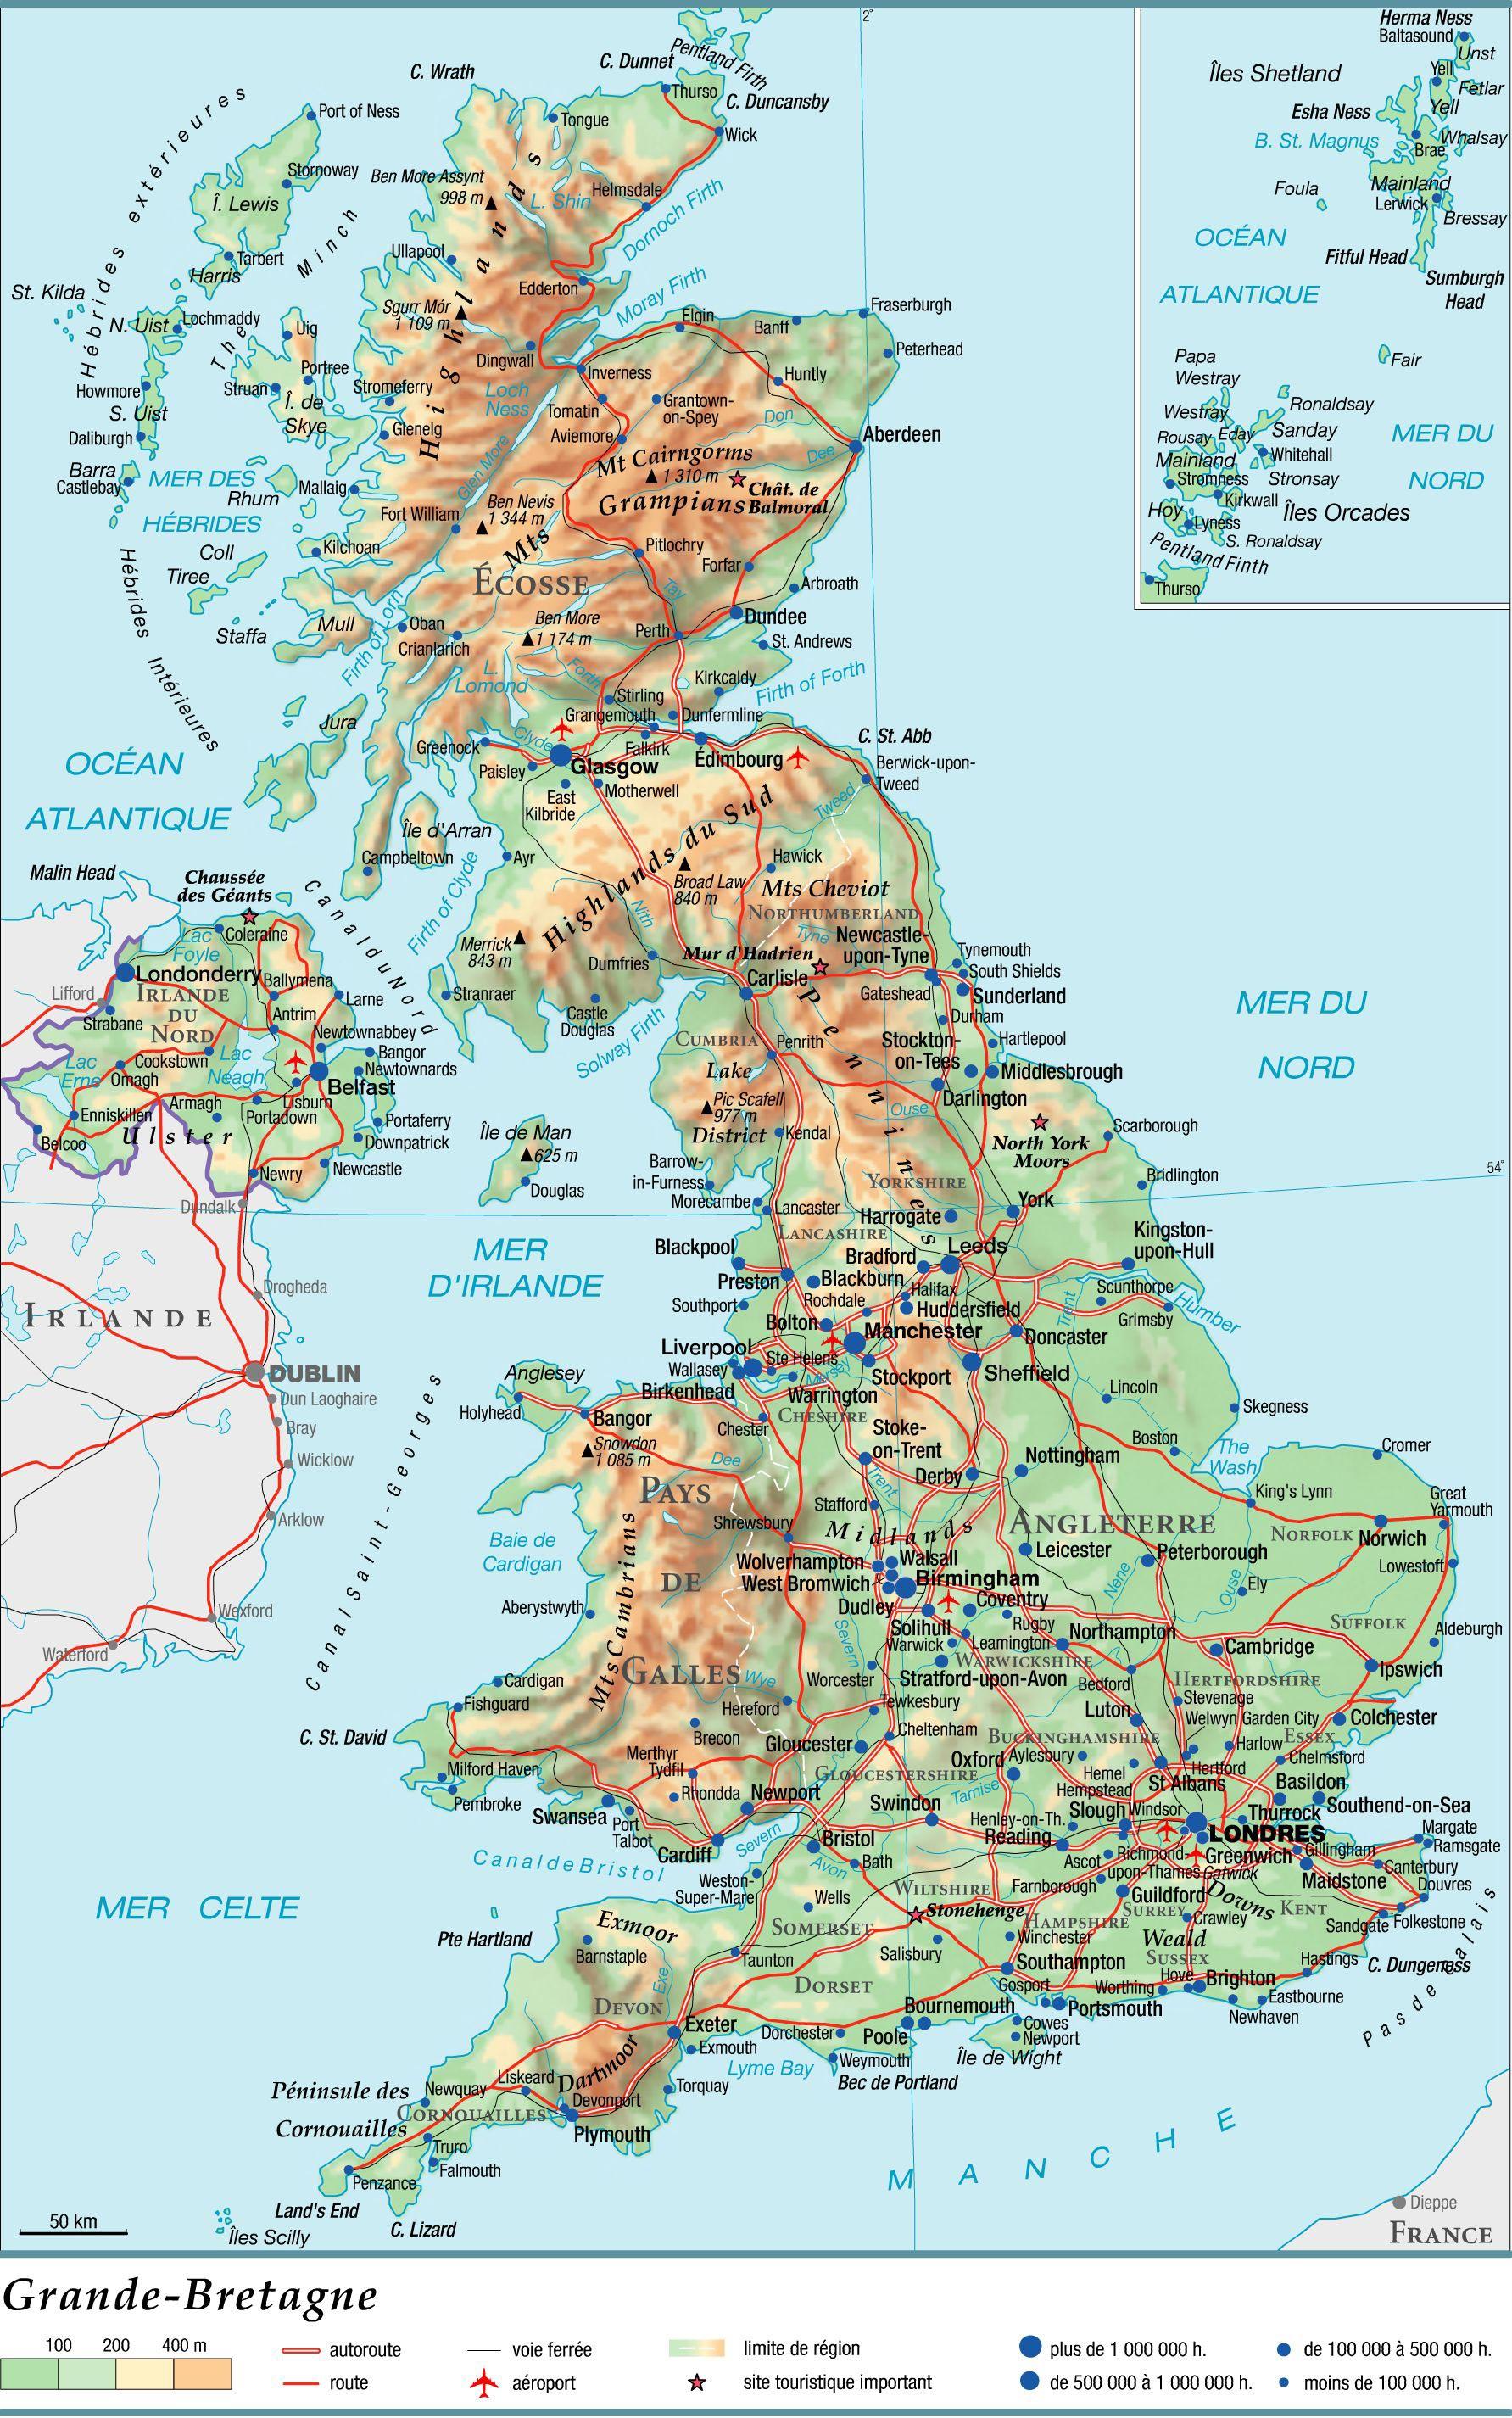 Carte Angleterre Grande Bretagne.Histoire De La Grande Bretagne Arts Et Voyages